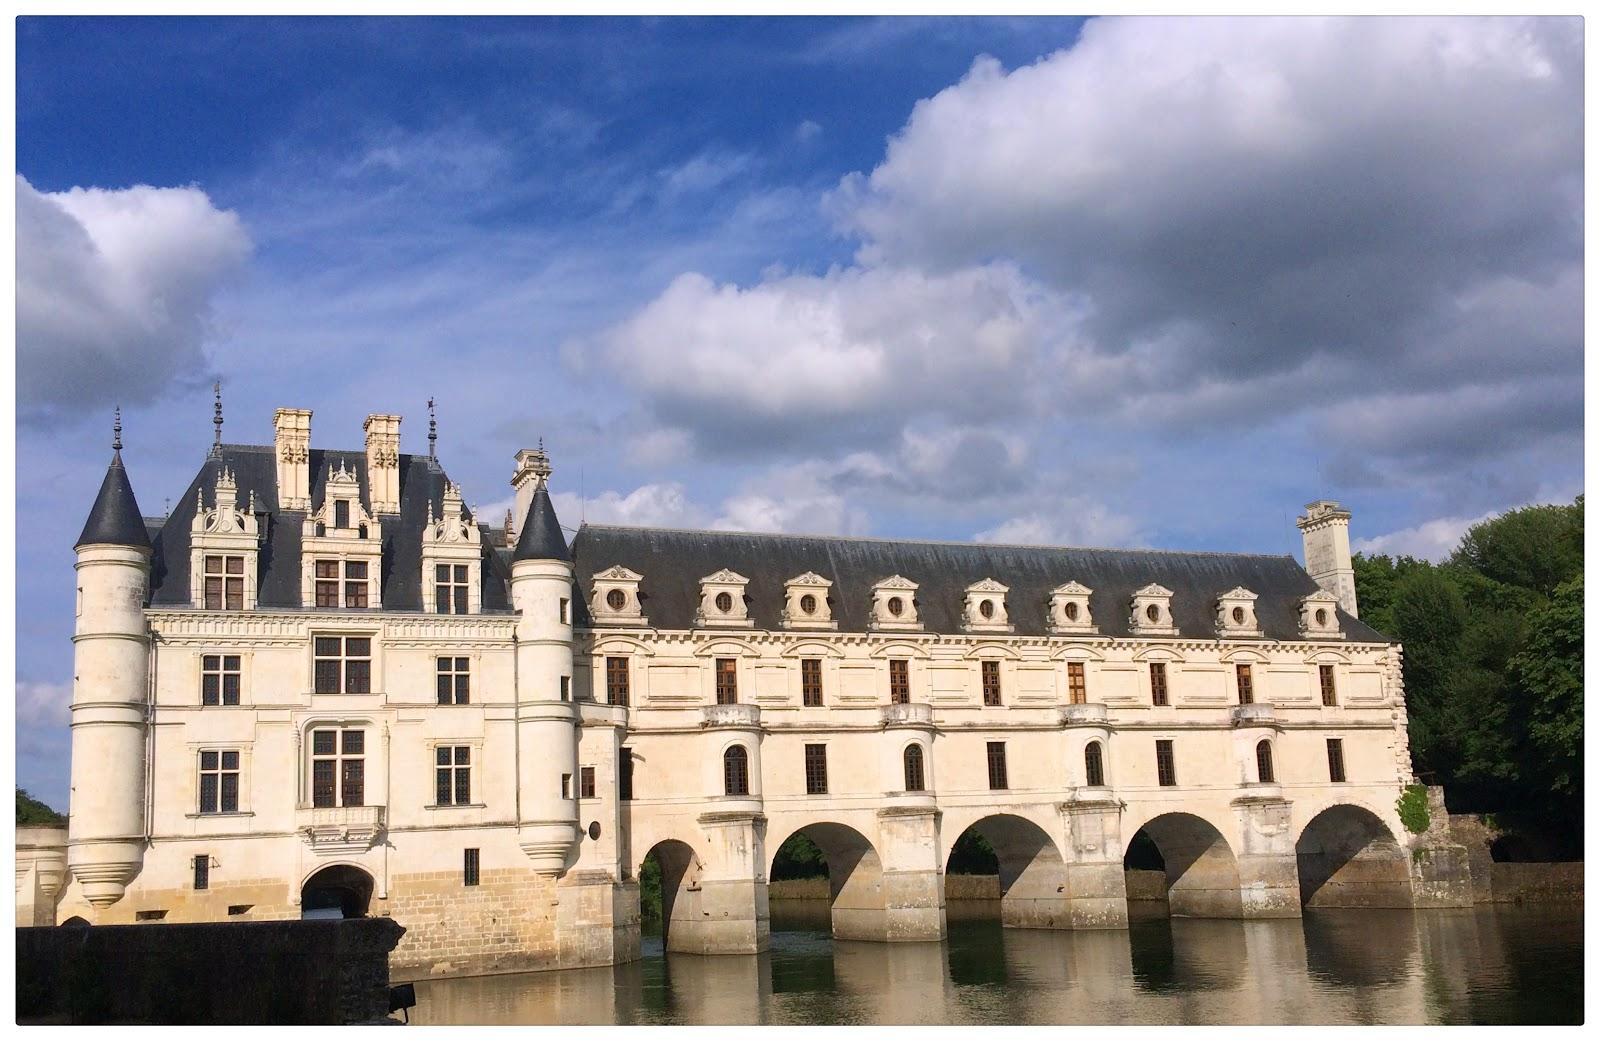 24_Chateau Chnonceau4_副本.jpg